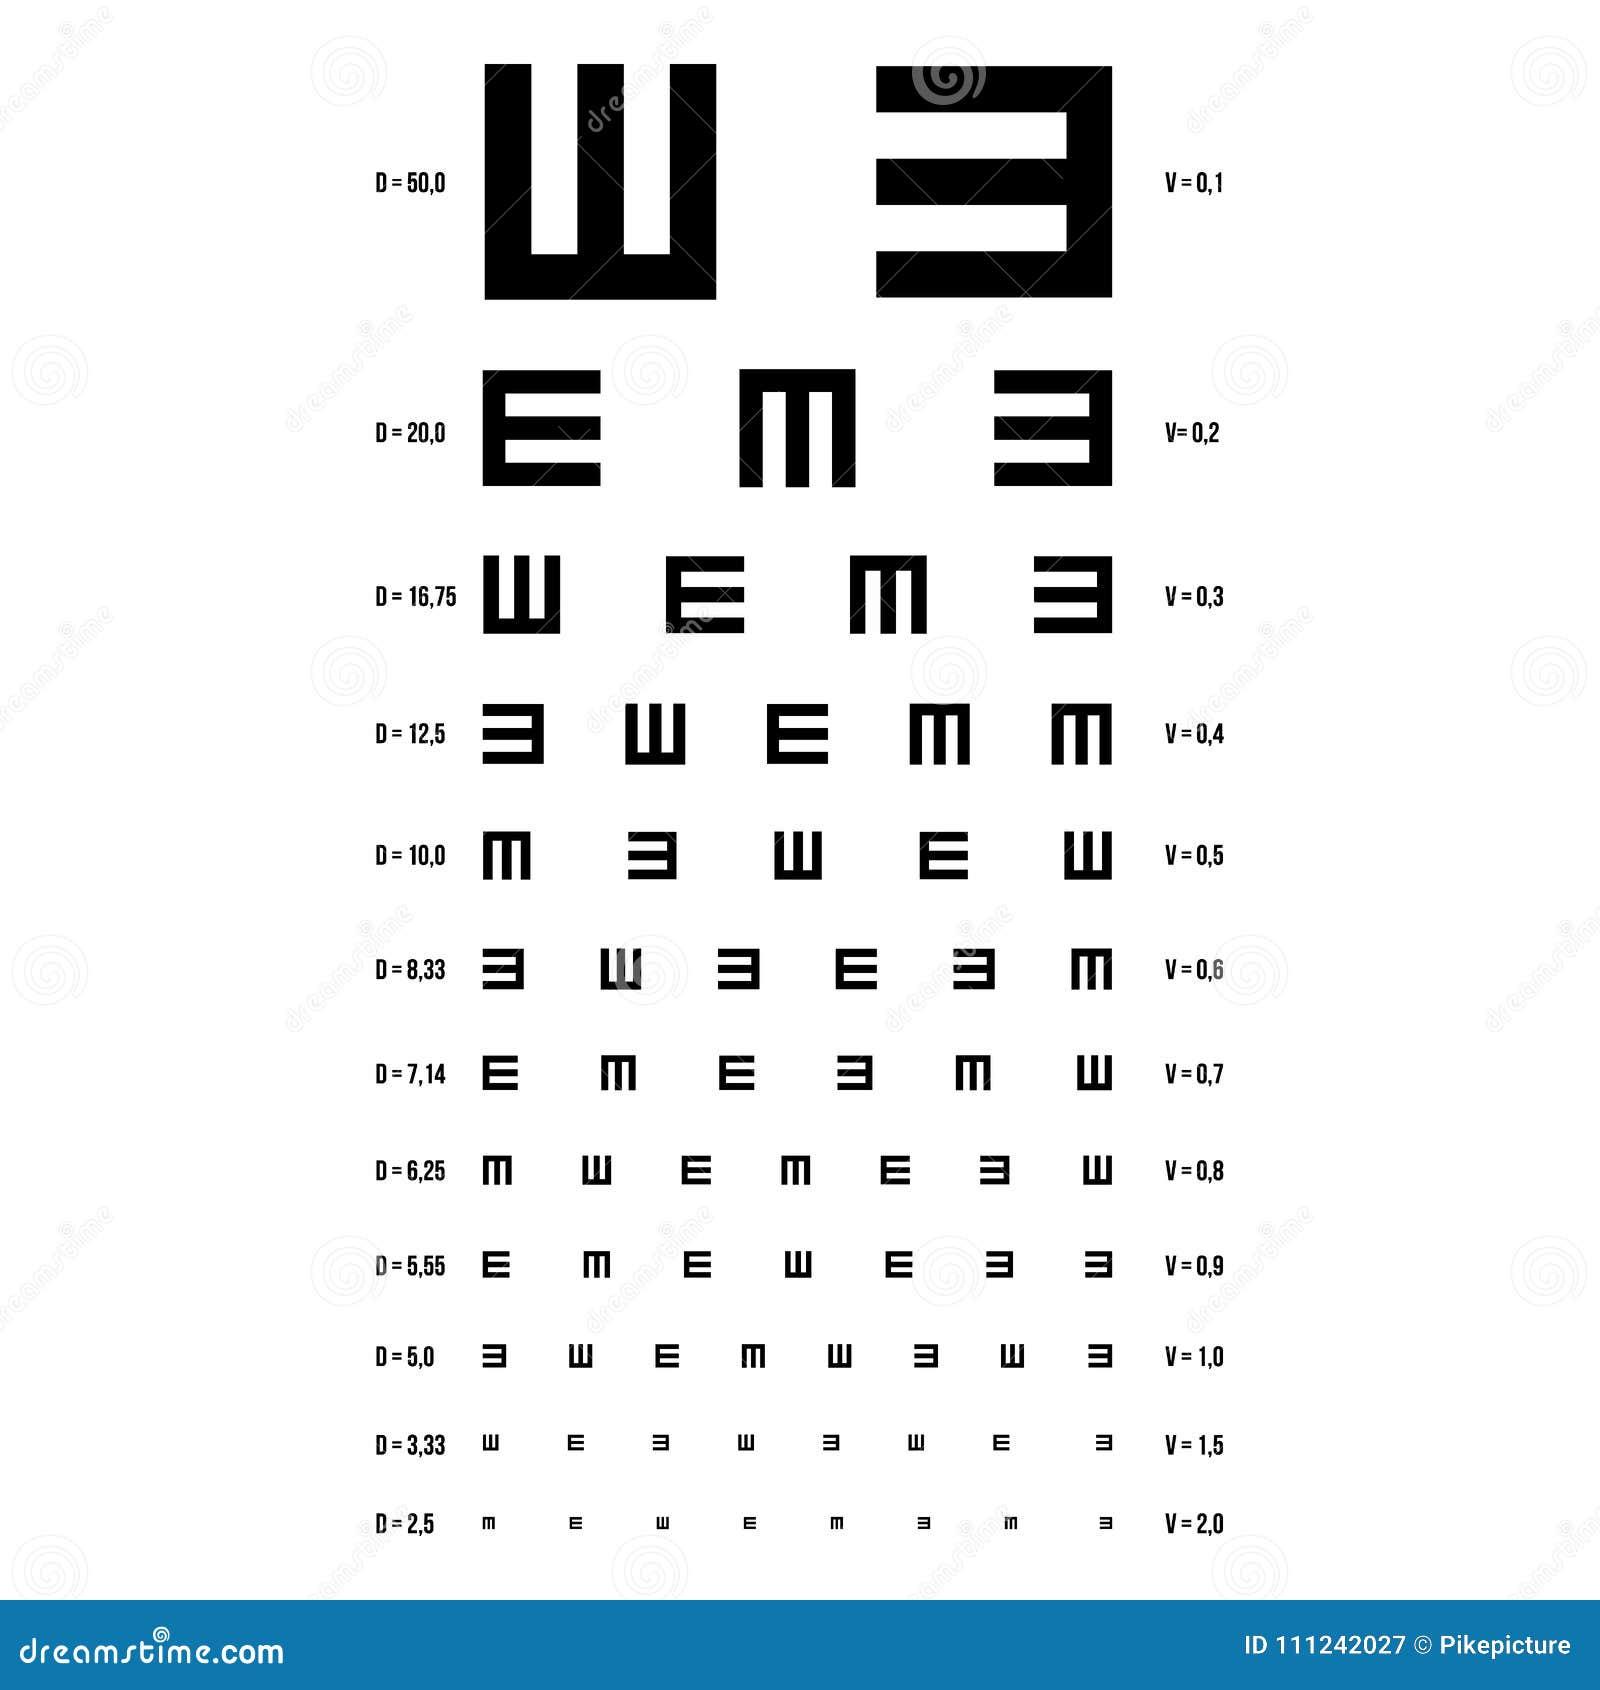 Eye test chart vector e chart vision exam optometrist check eye test chart vector e chart vision exam optometrist check medical eye diagnostic sight eyesight ophthalmic geenschuldenfo Gallery